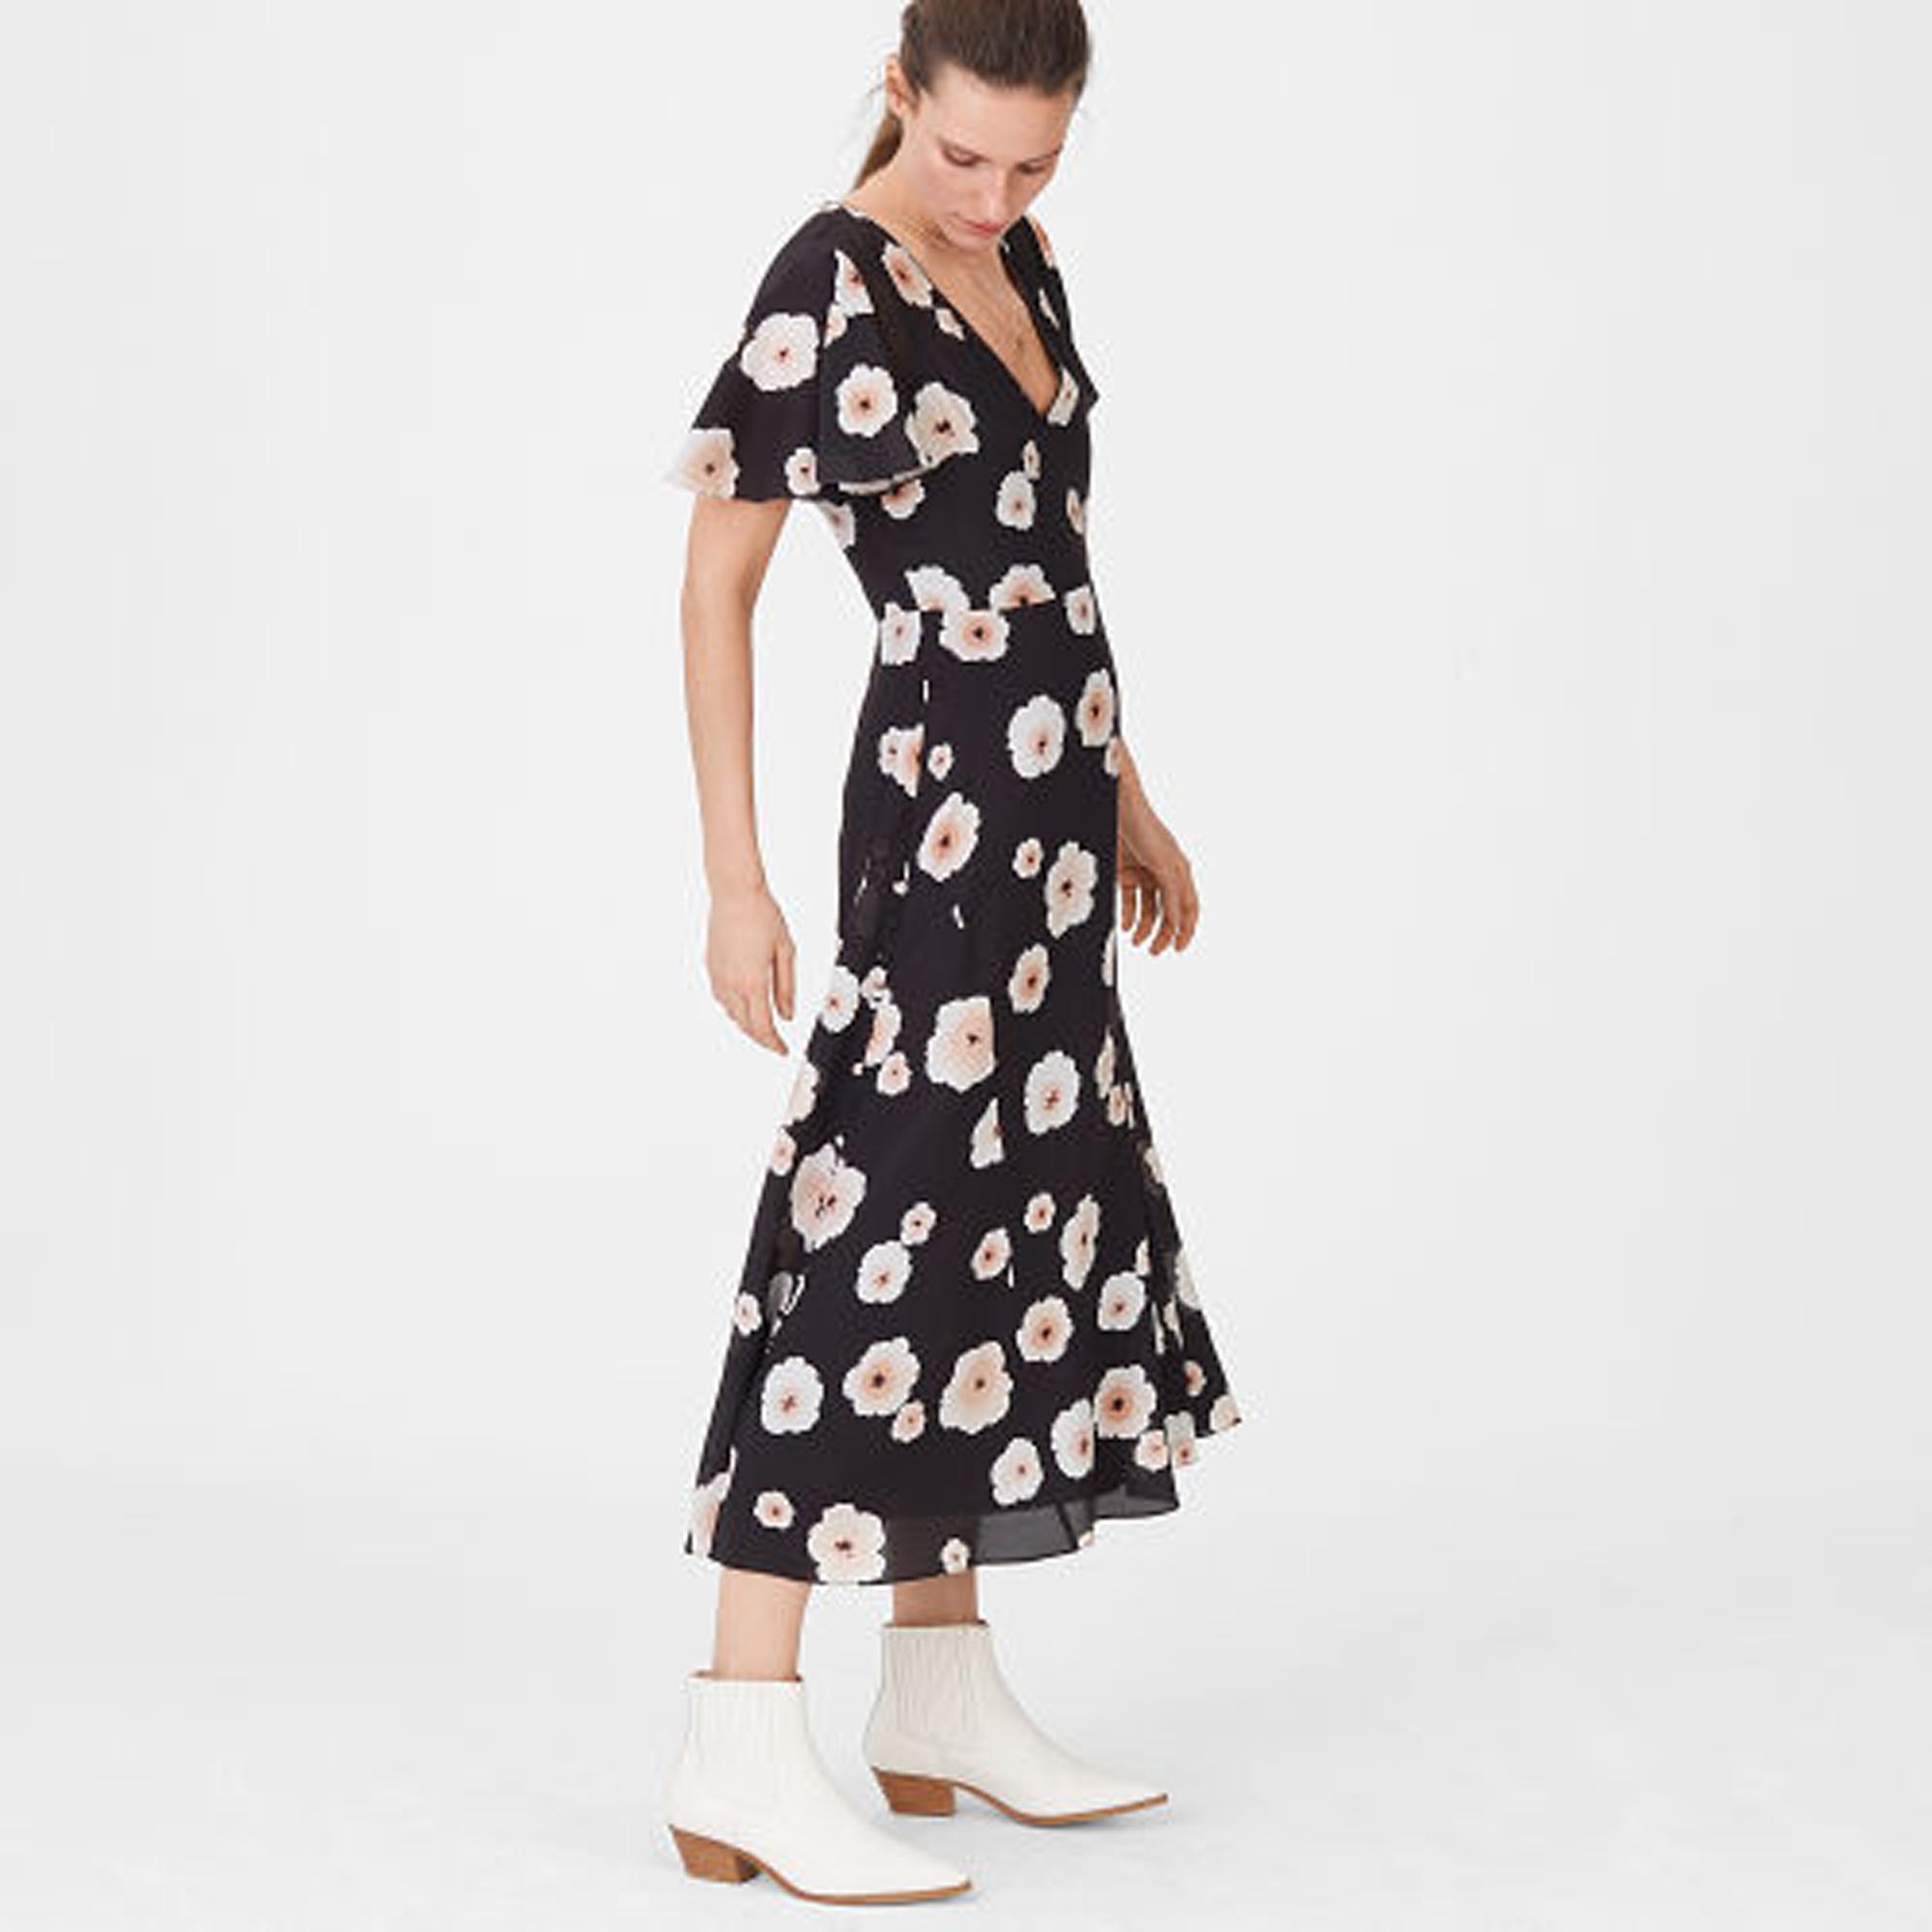 Zameeka Silk Floral Dress   HK$3,590